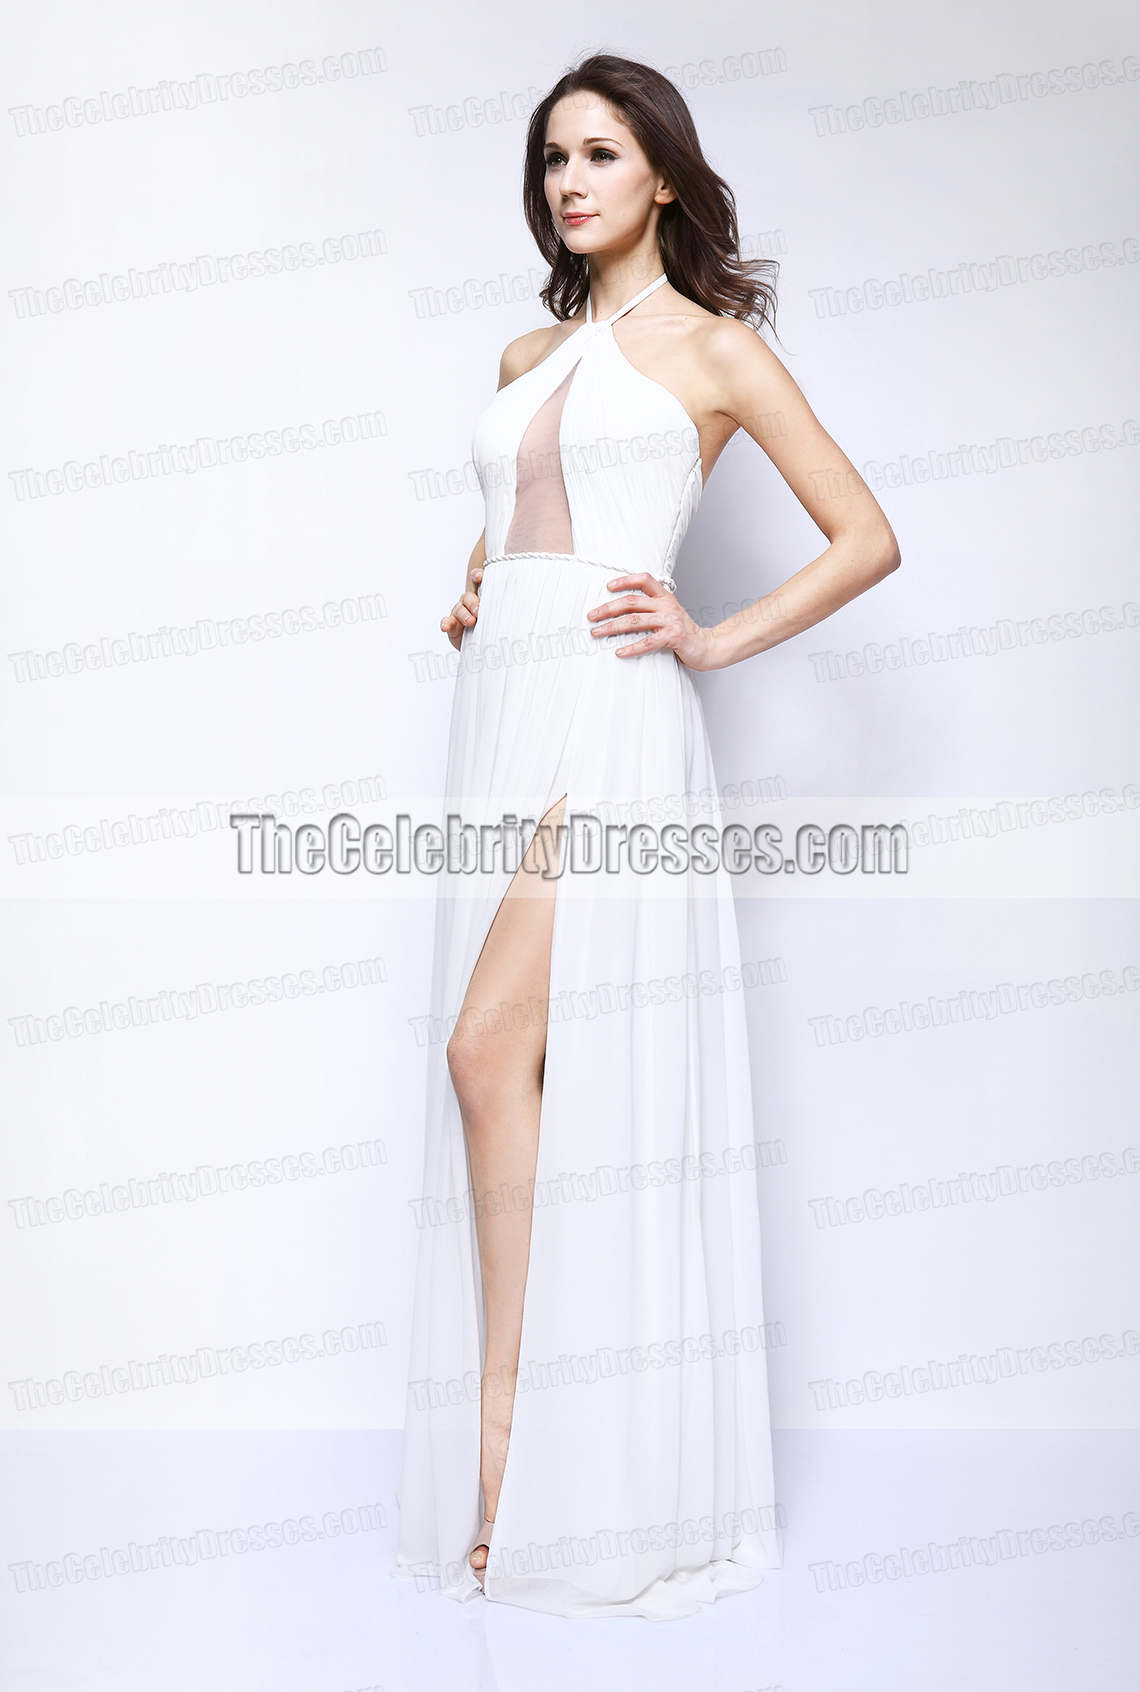 Taylor Swift White Evening Dress 2013 Fragrance Foundation Awards